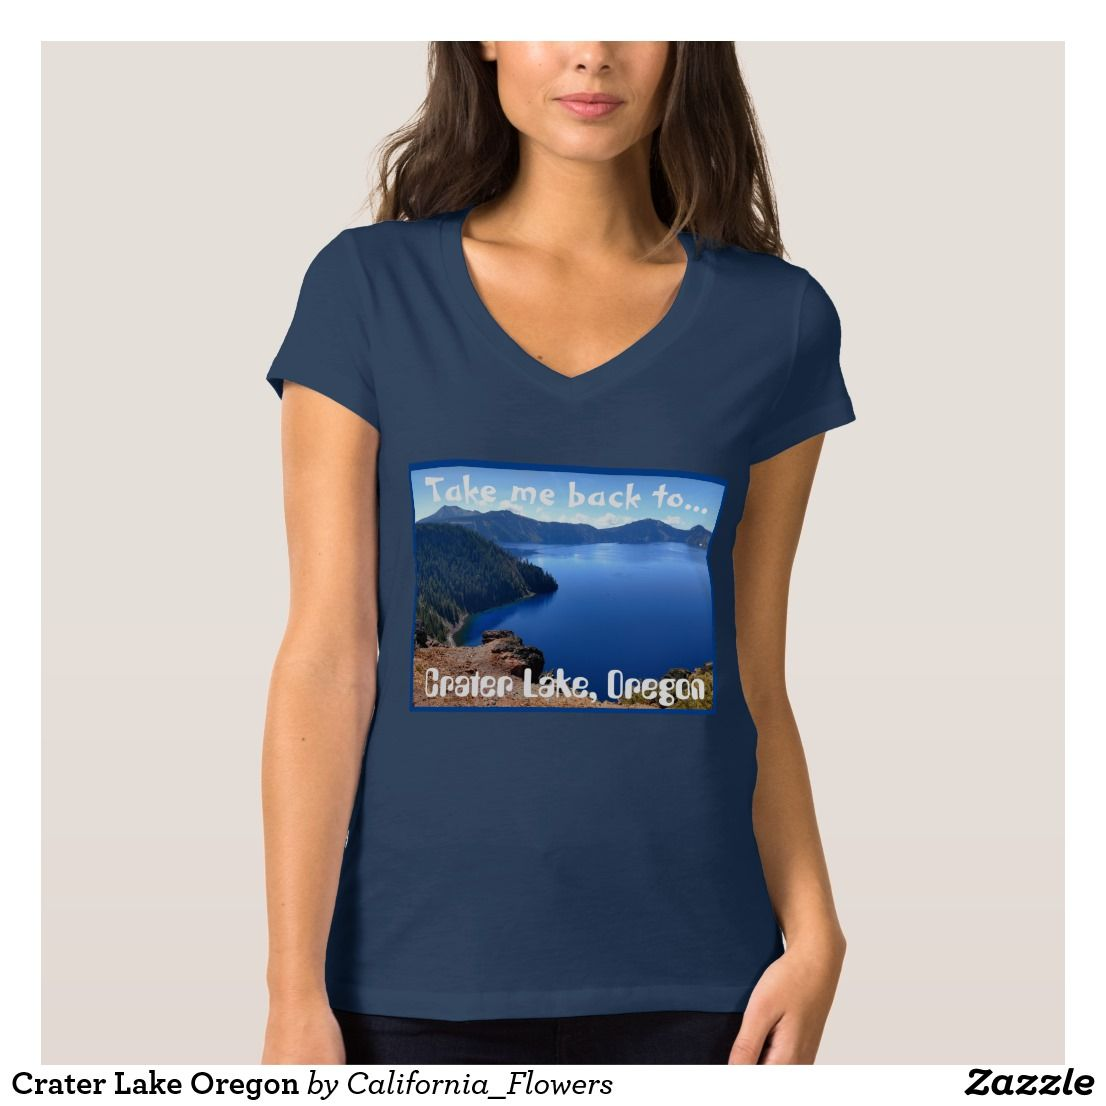 Crater Lake Oregon T-shirt, Women's, Size: Adult S, Blue #craterlakeoregon